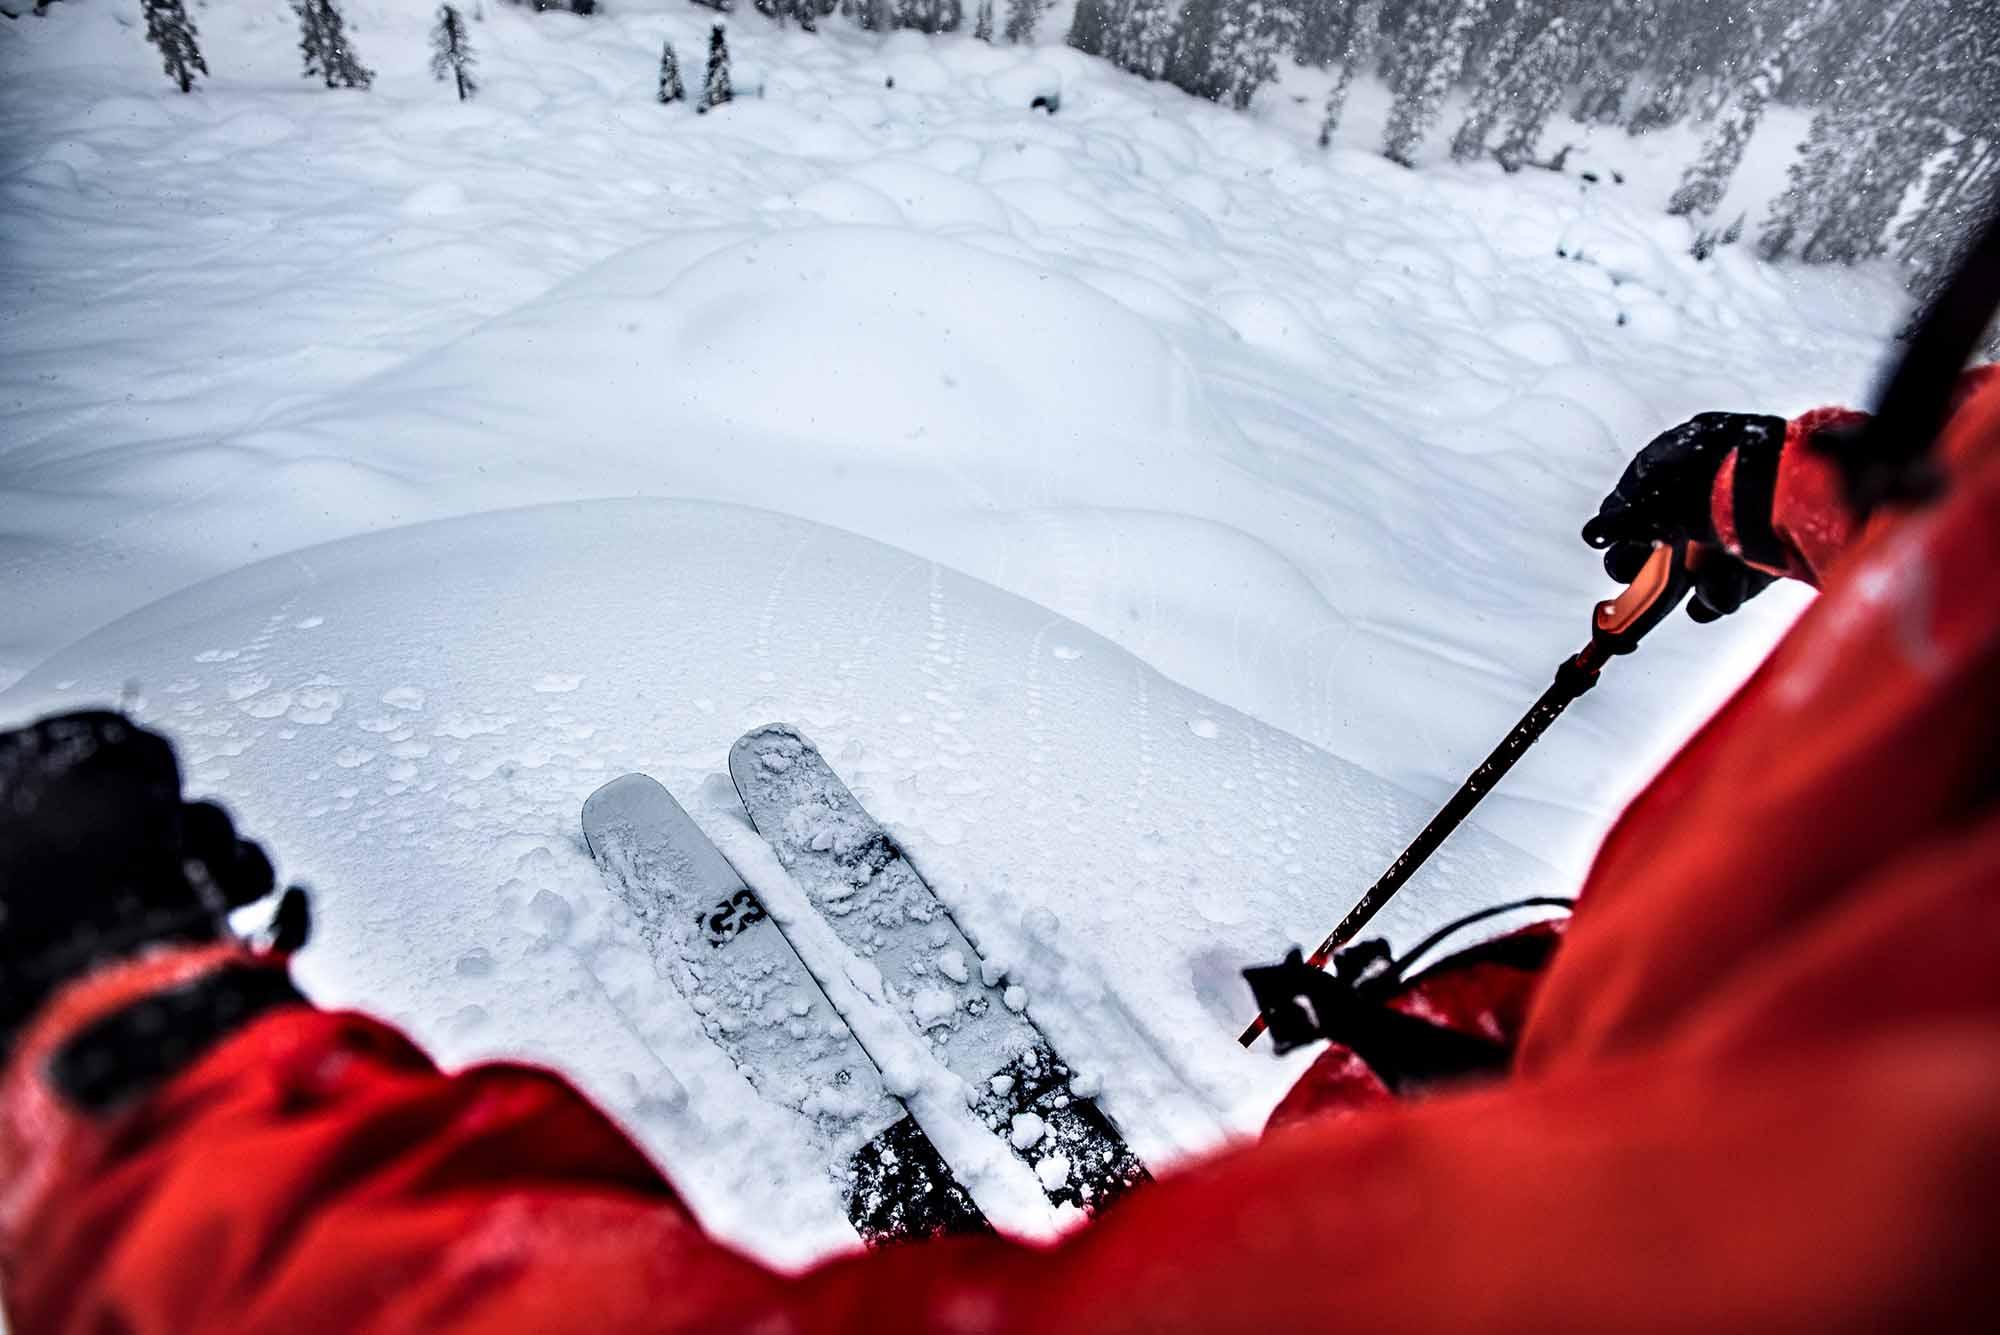 Skier: Matt Francisty. Location: Whistler backcountry, BC, Canada